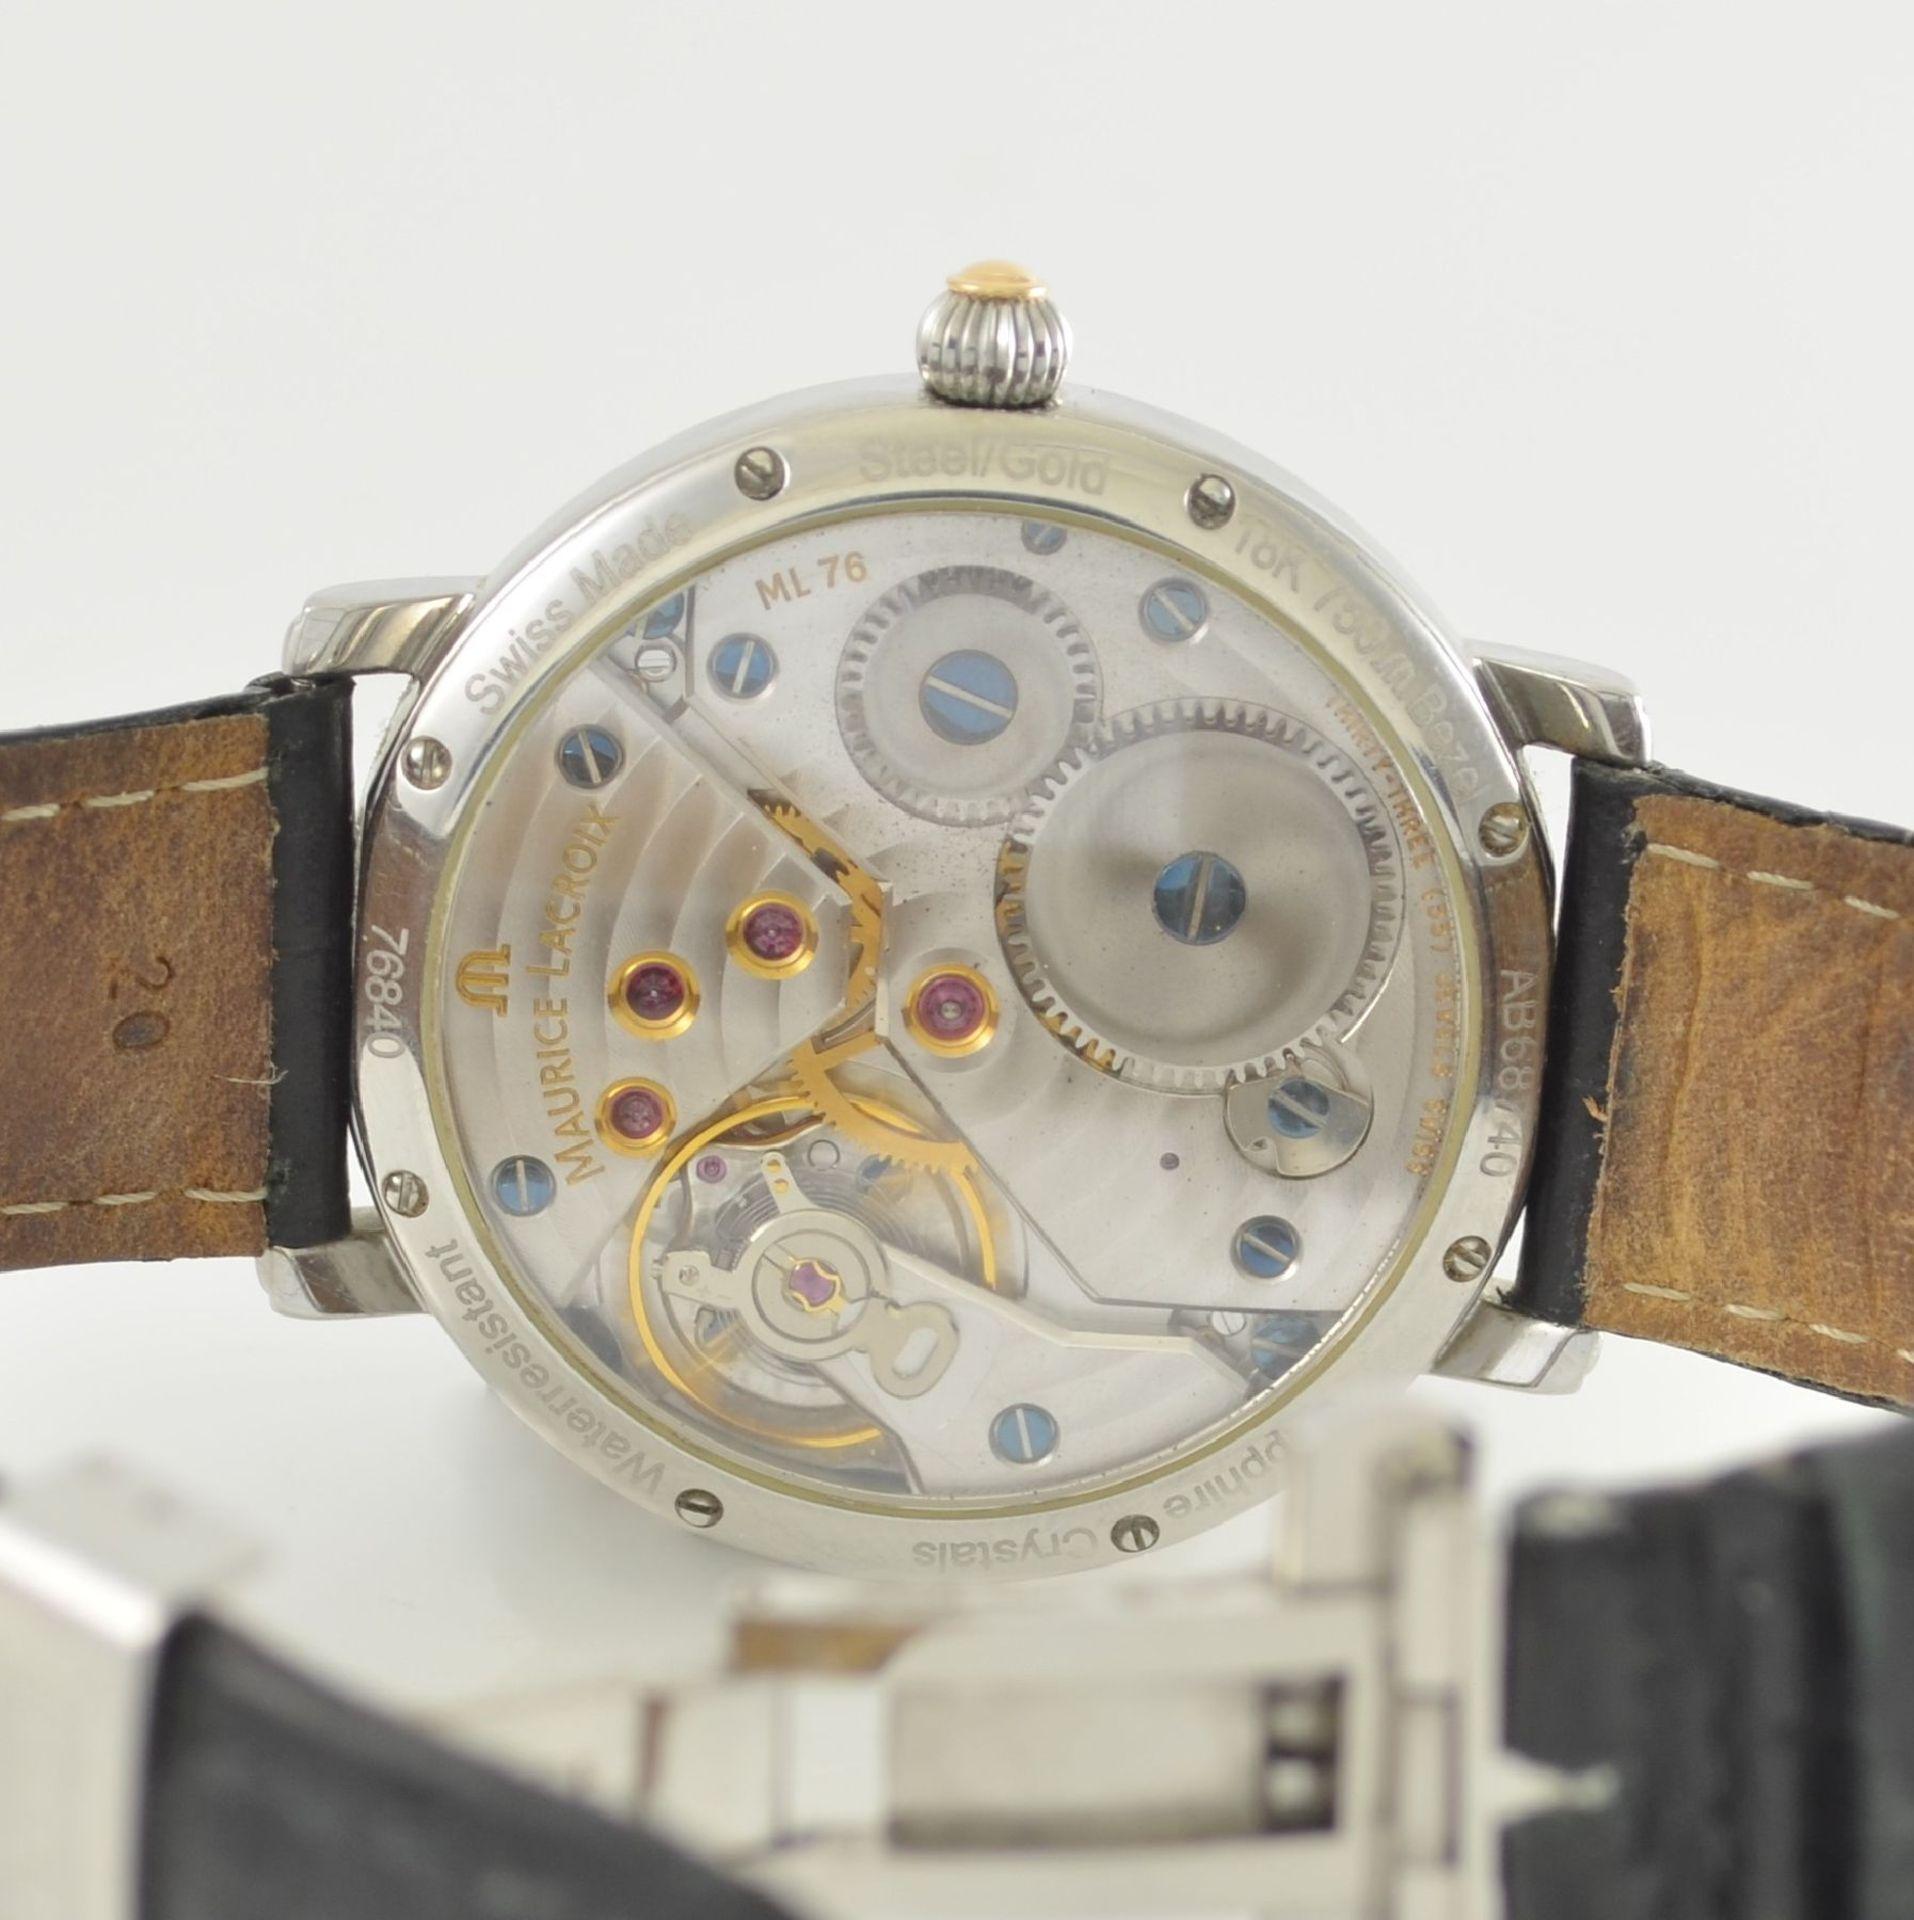 MAURICE LACROIX Herrenarmbanduhr aus der Masterpiece Collection Modell Calendrier Rétrograde, - Bild 6 aus 7